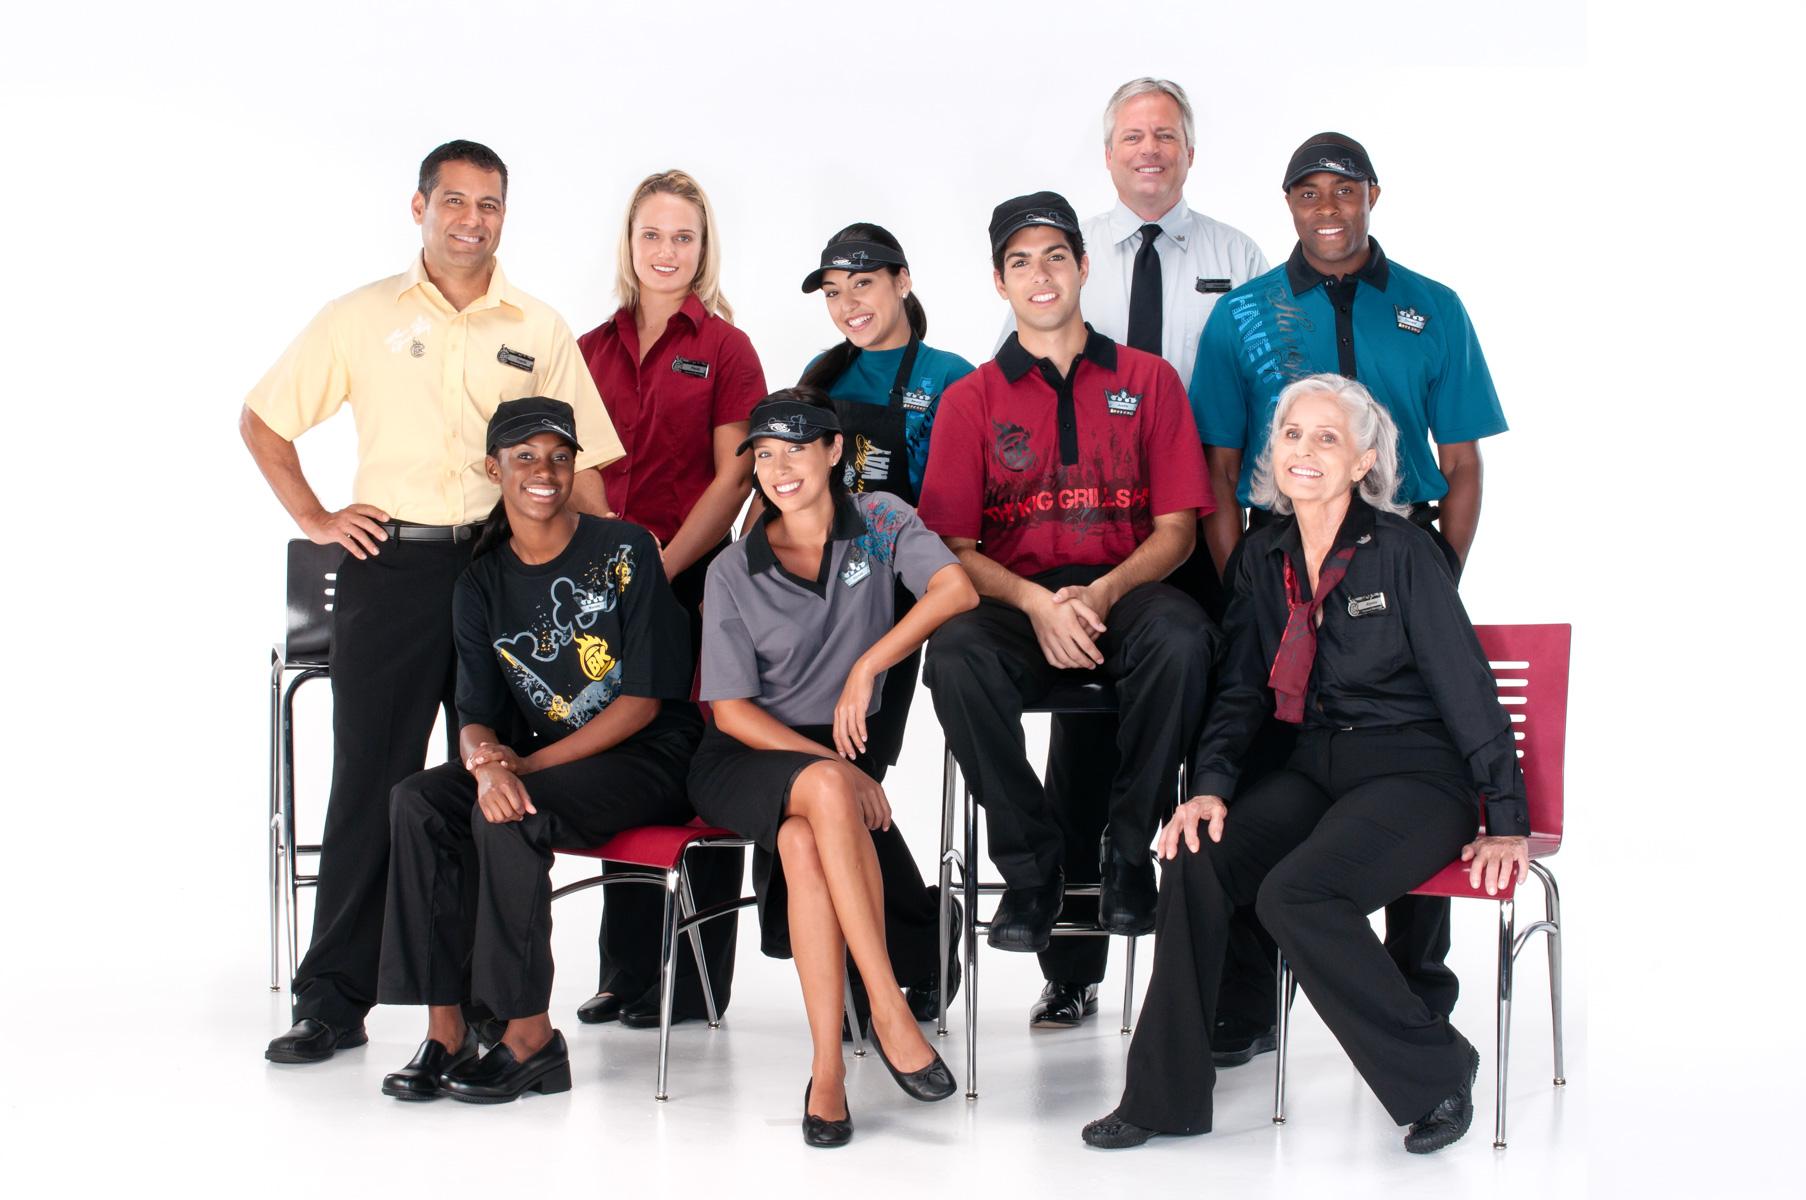 Burger-king-uniform-catalog-106.jpg